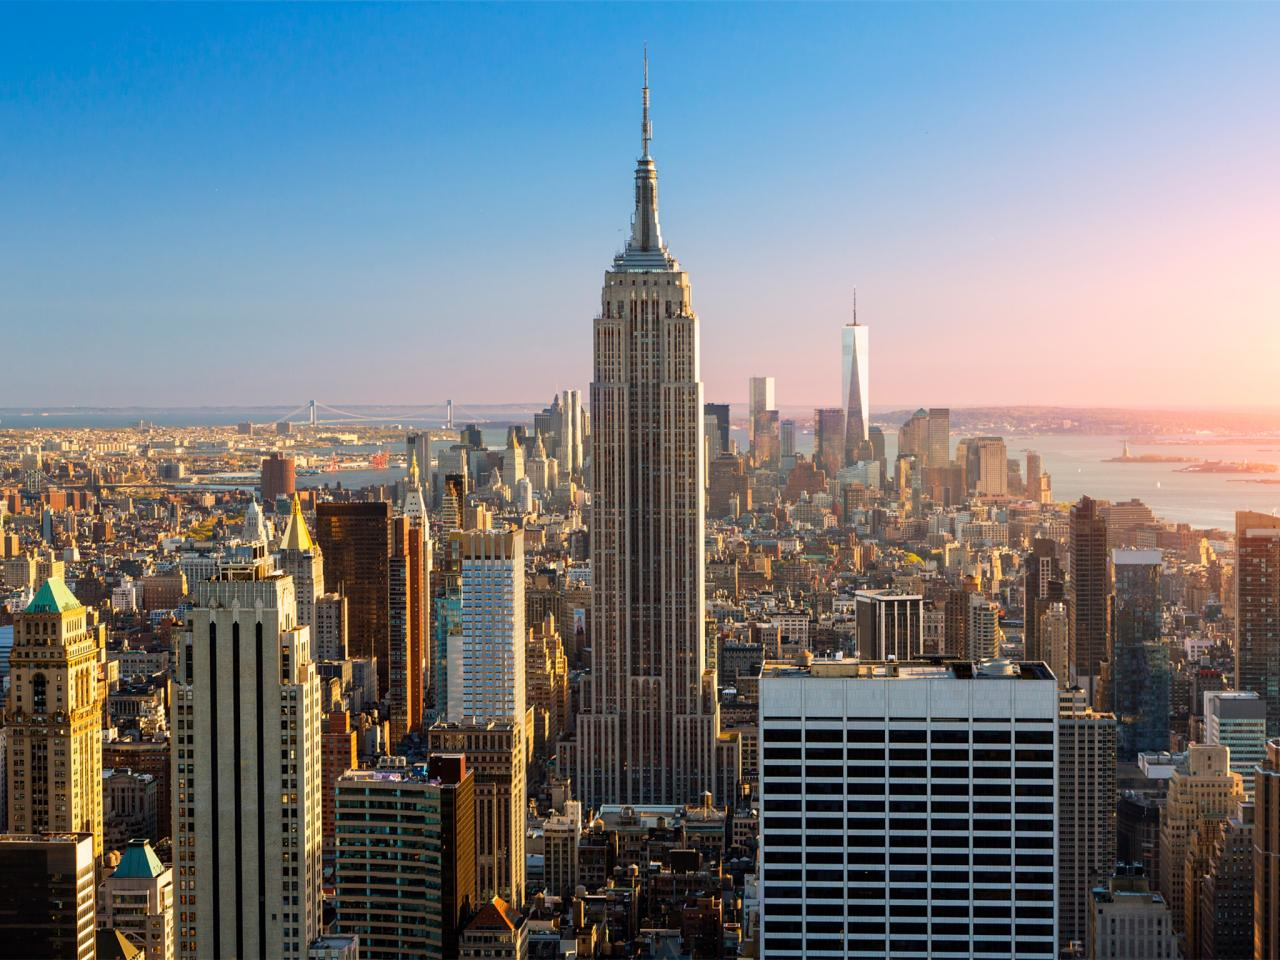 empire-state-building-cityscape-new-york-city.jpg.rend.tccom.1280.960.jpeg